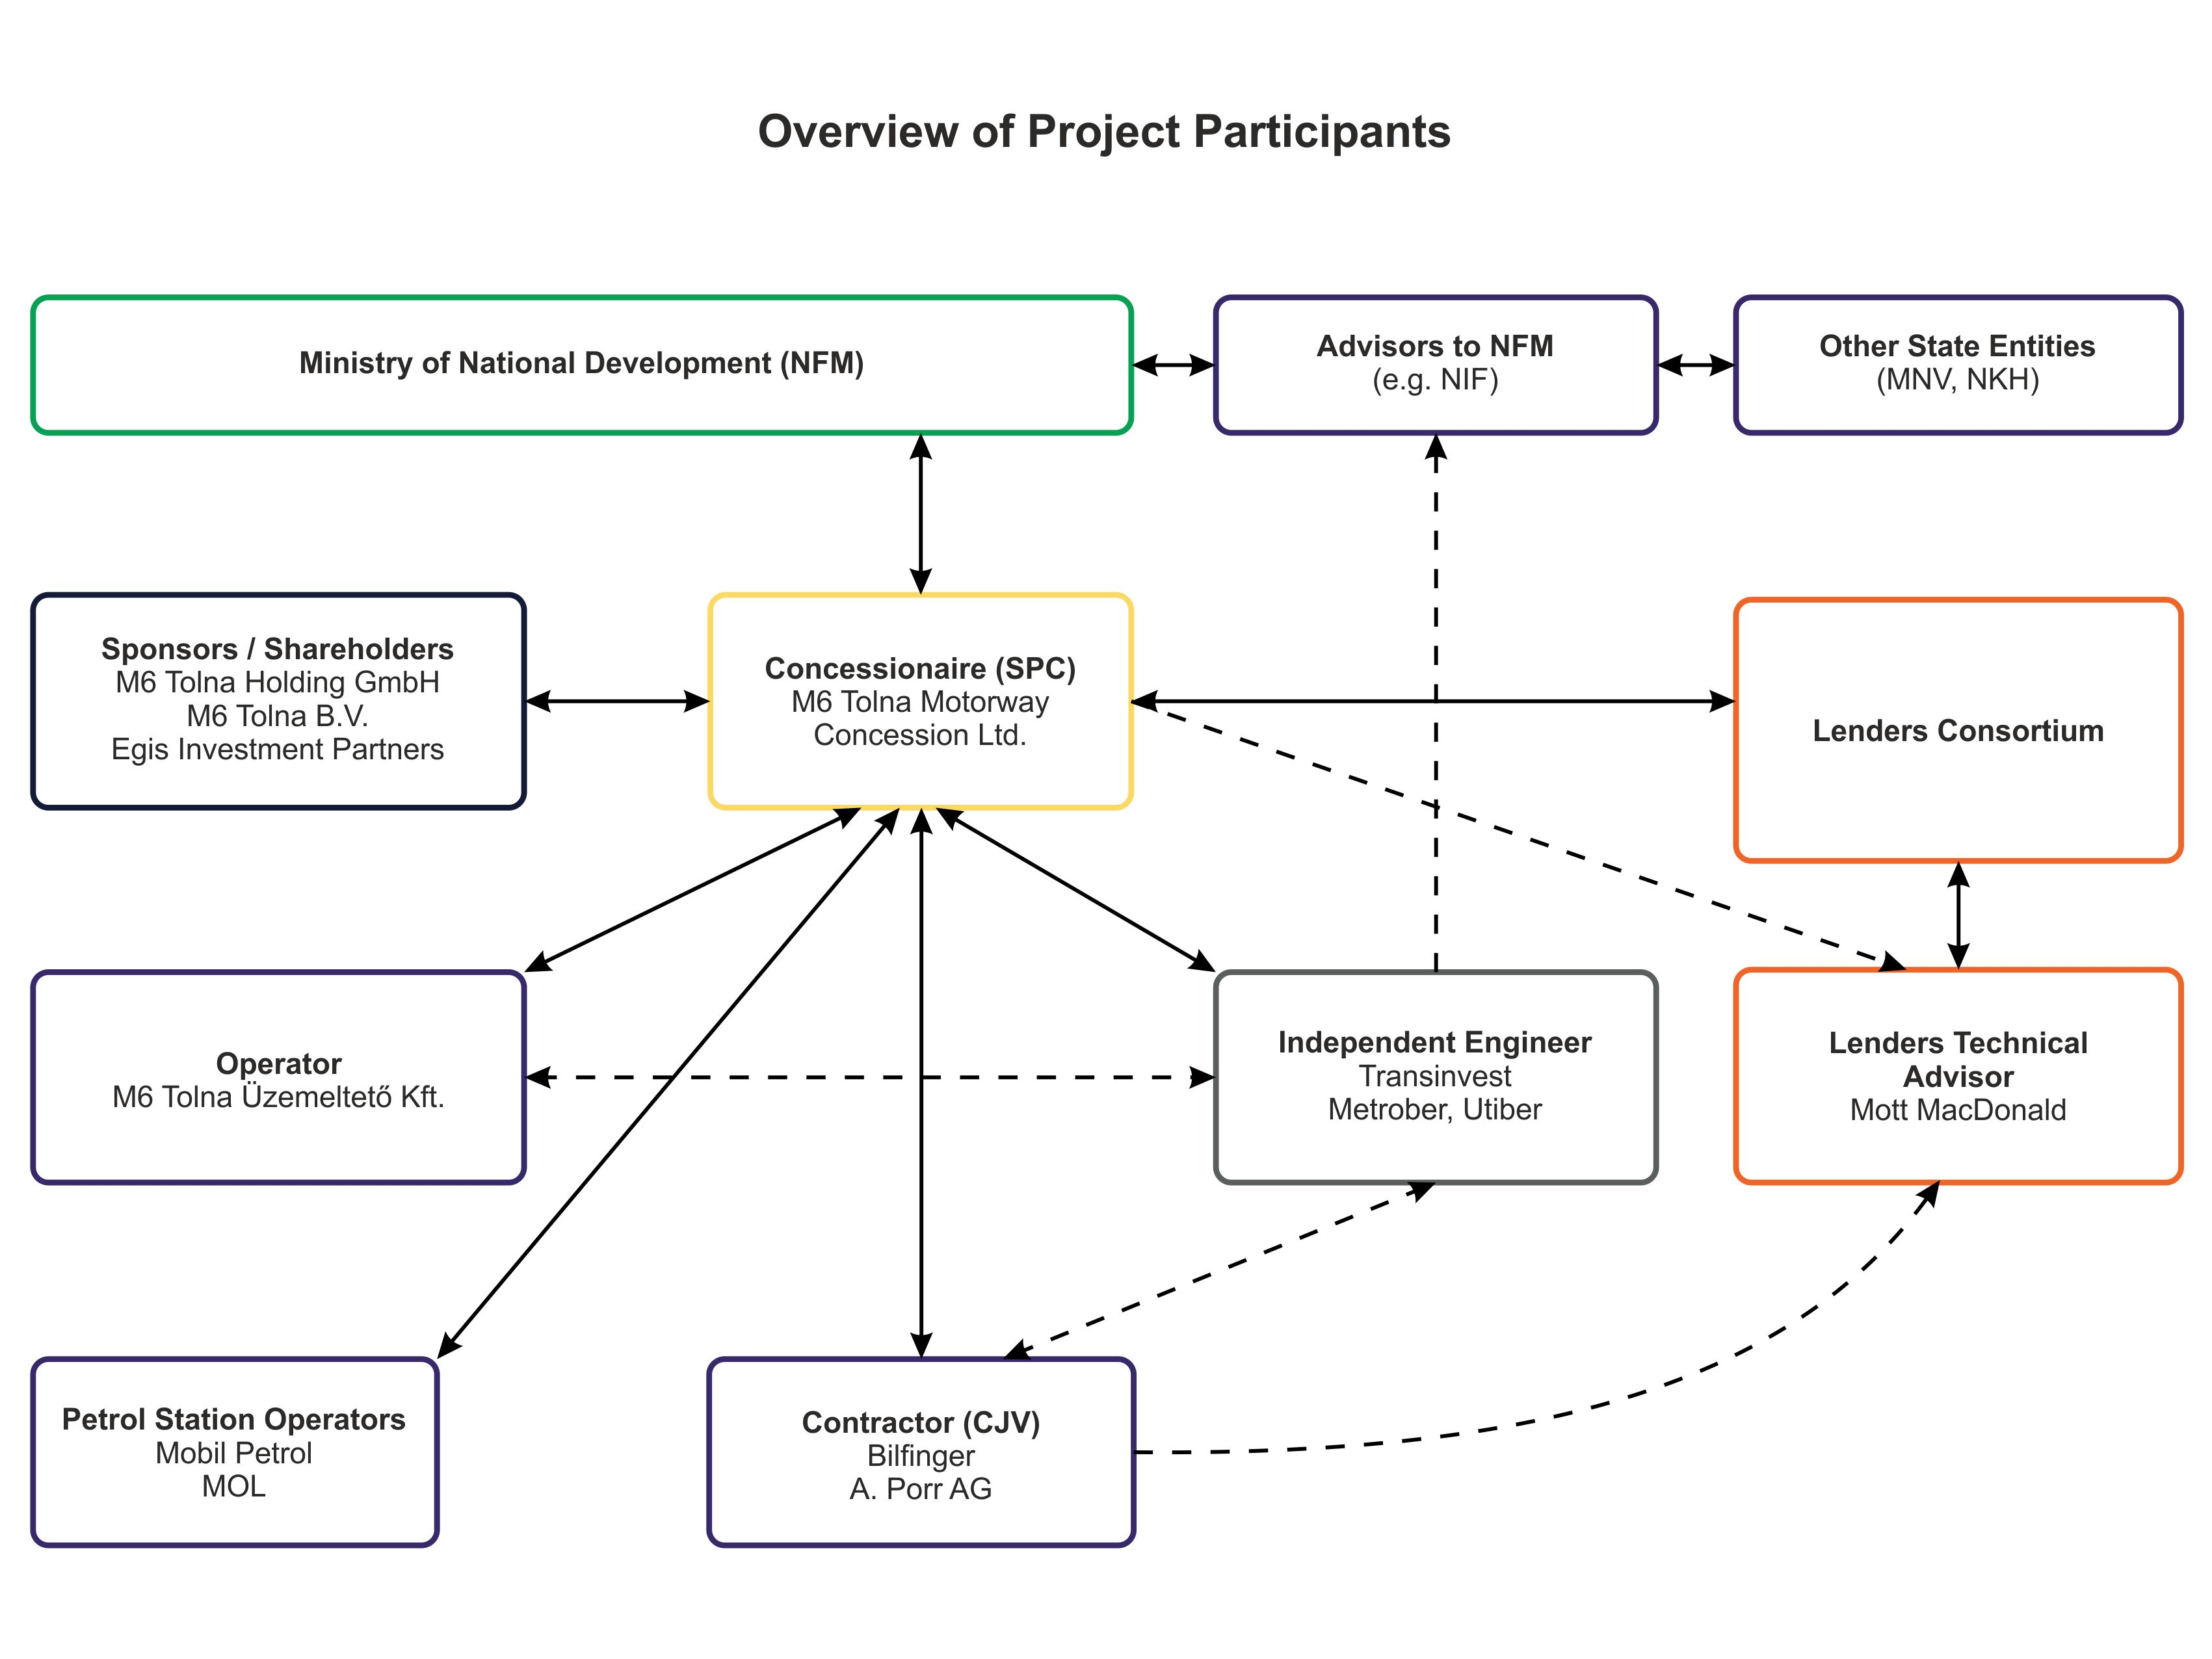 m6tolna-organization